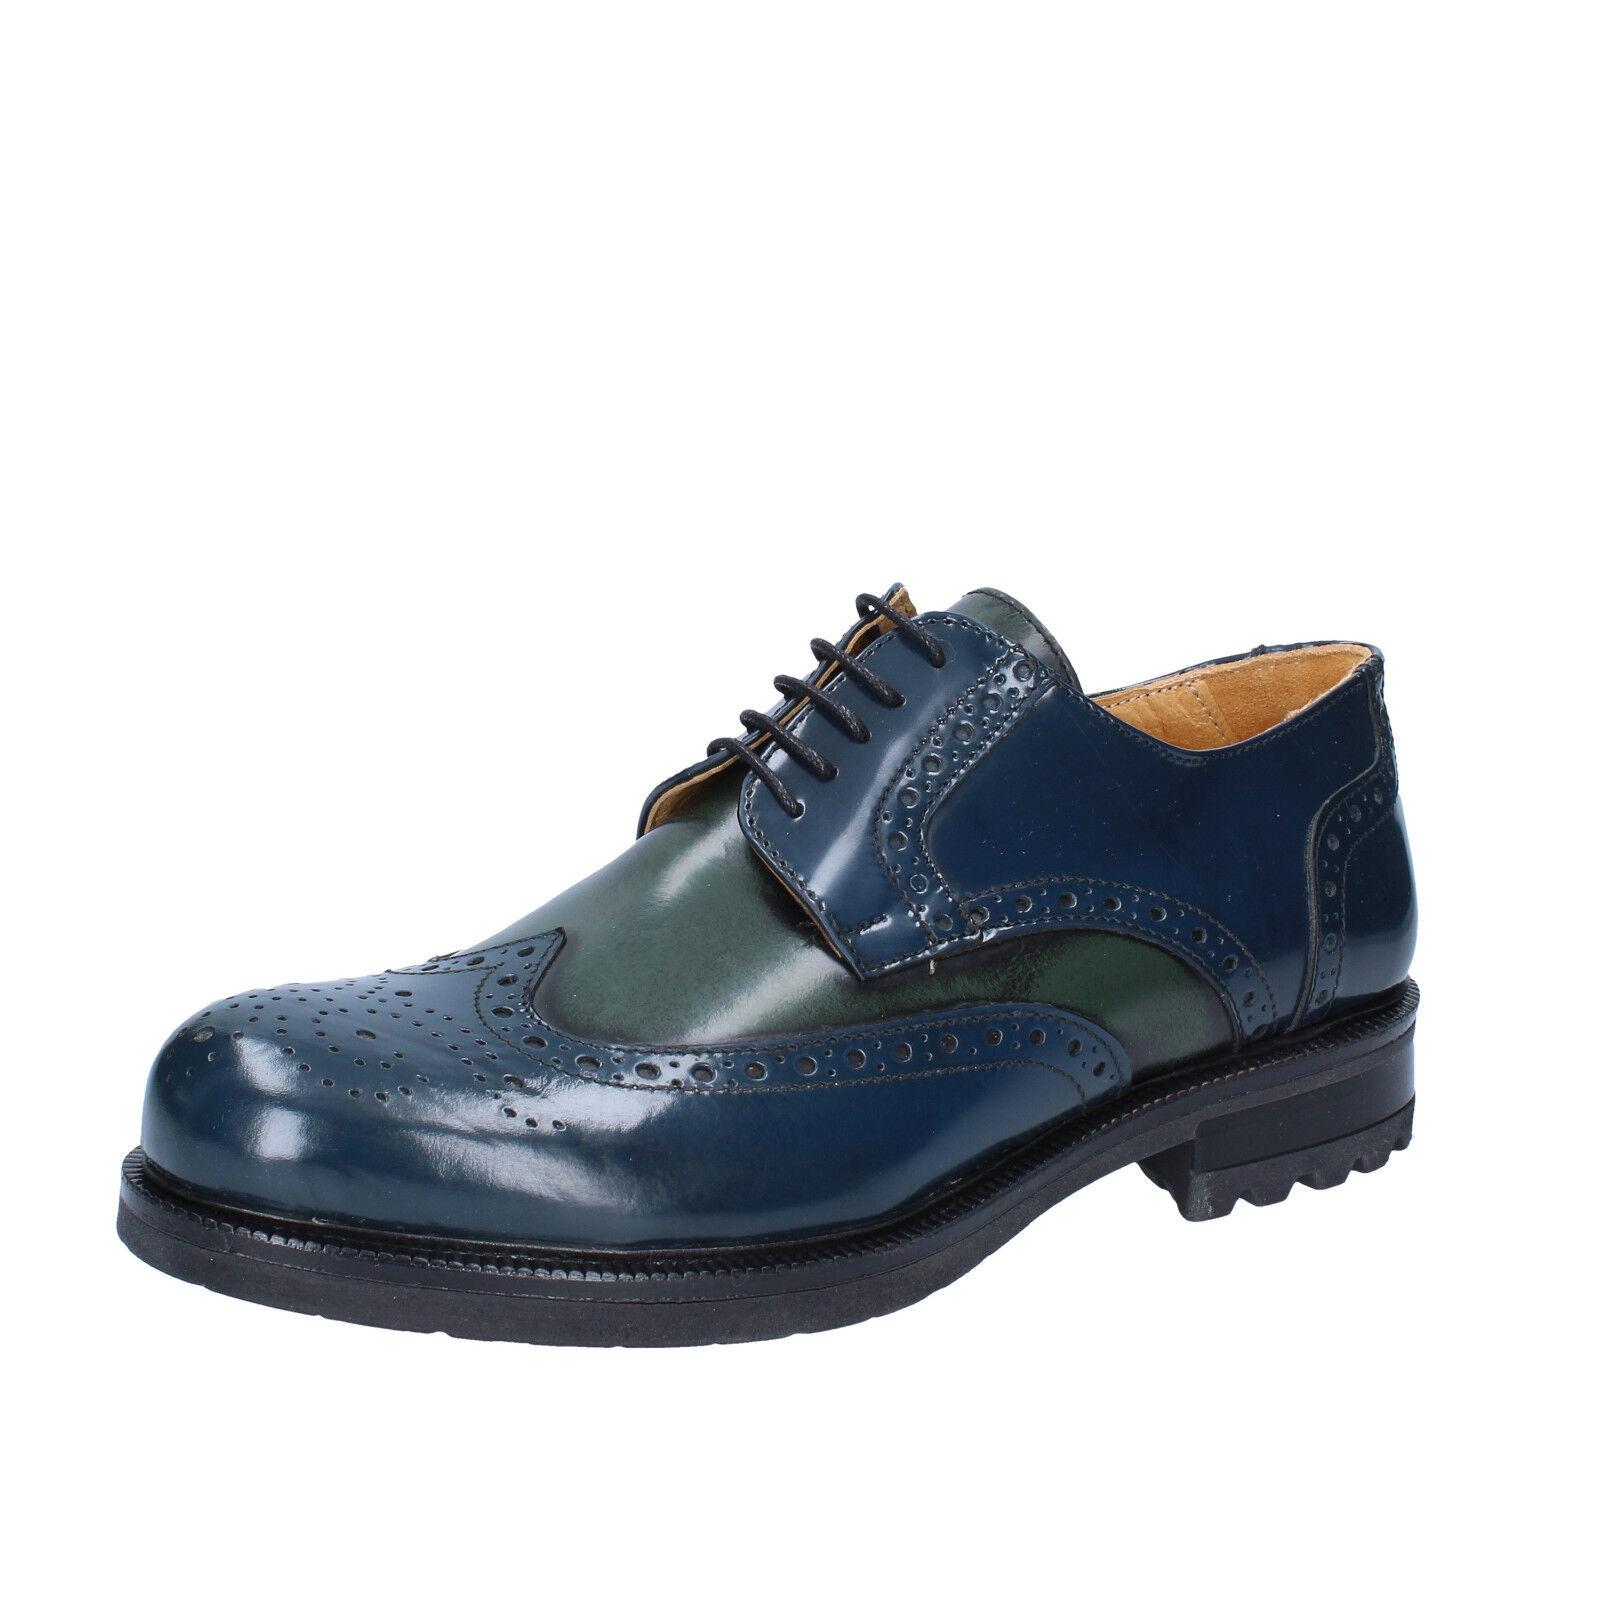 Herren schuhe SALVO BARONE 42 EU elegante blau Grün Glänzende Haut BZ179-D